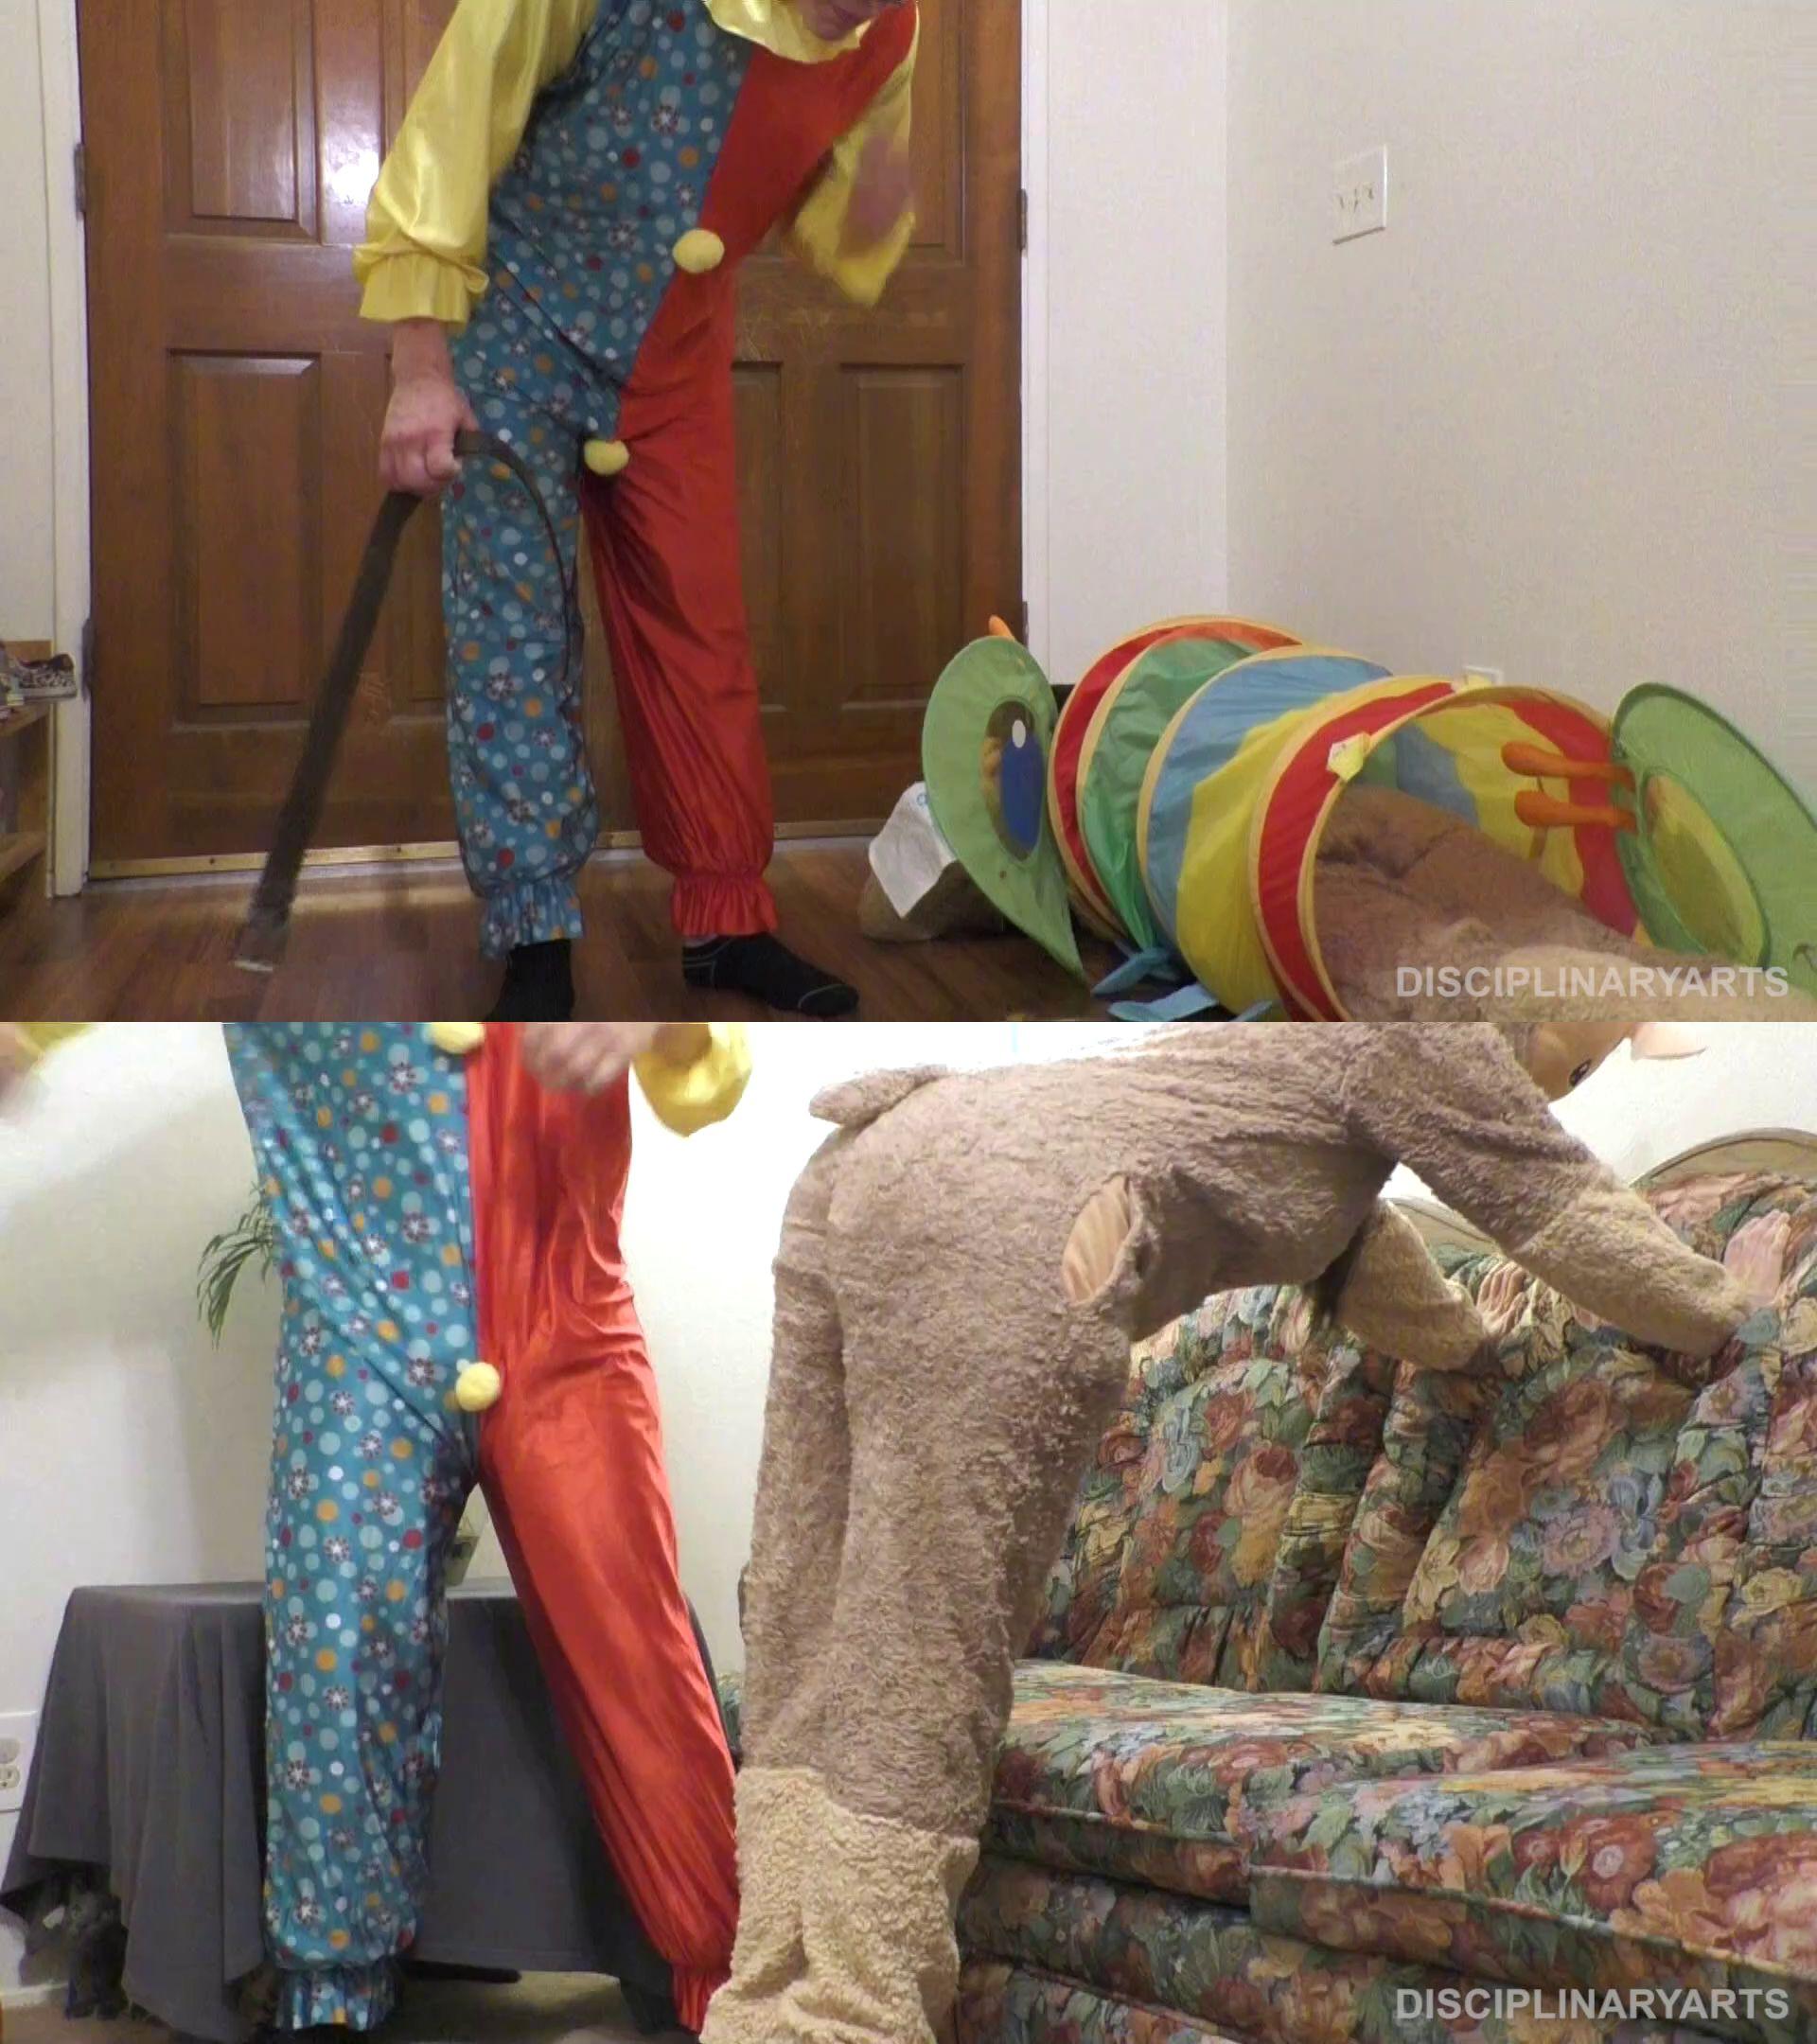 Disciplinary Arts – MP4/HD – Kyle Johnson, Yasmine Sinclair – Game Night Series: Costume Madness 2